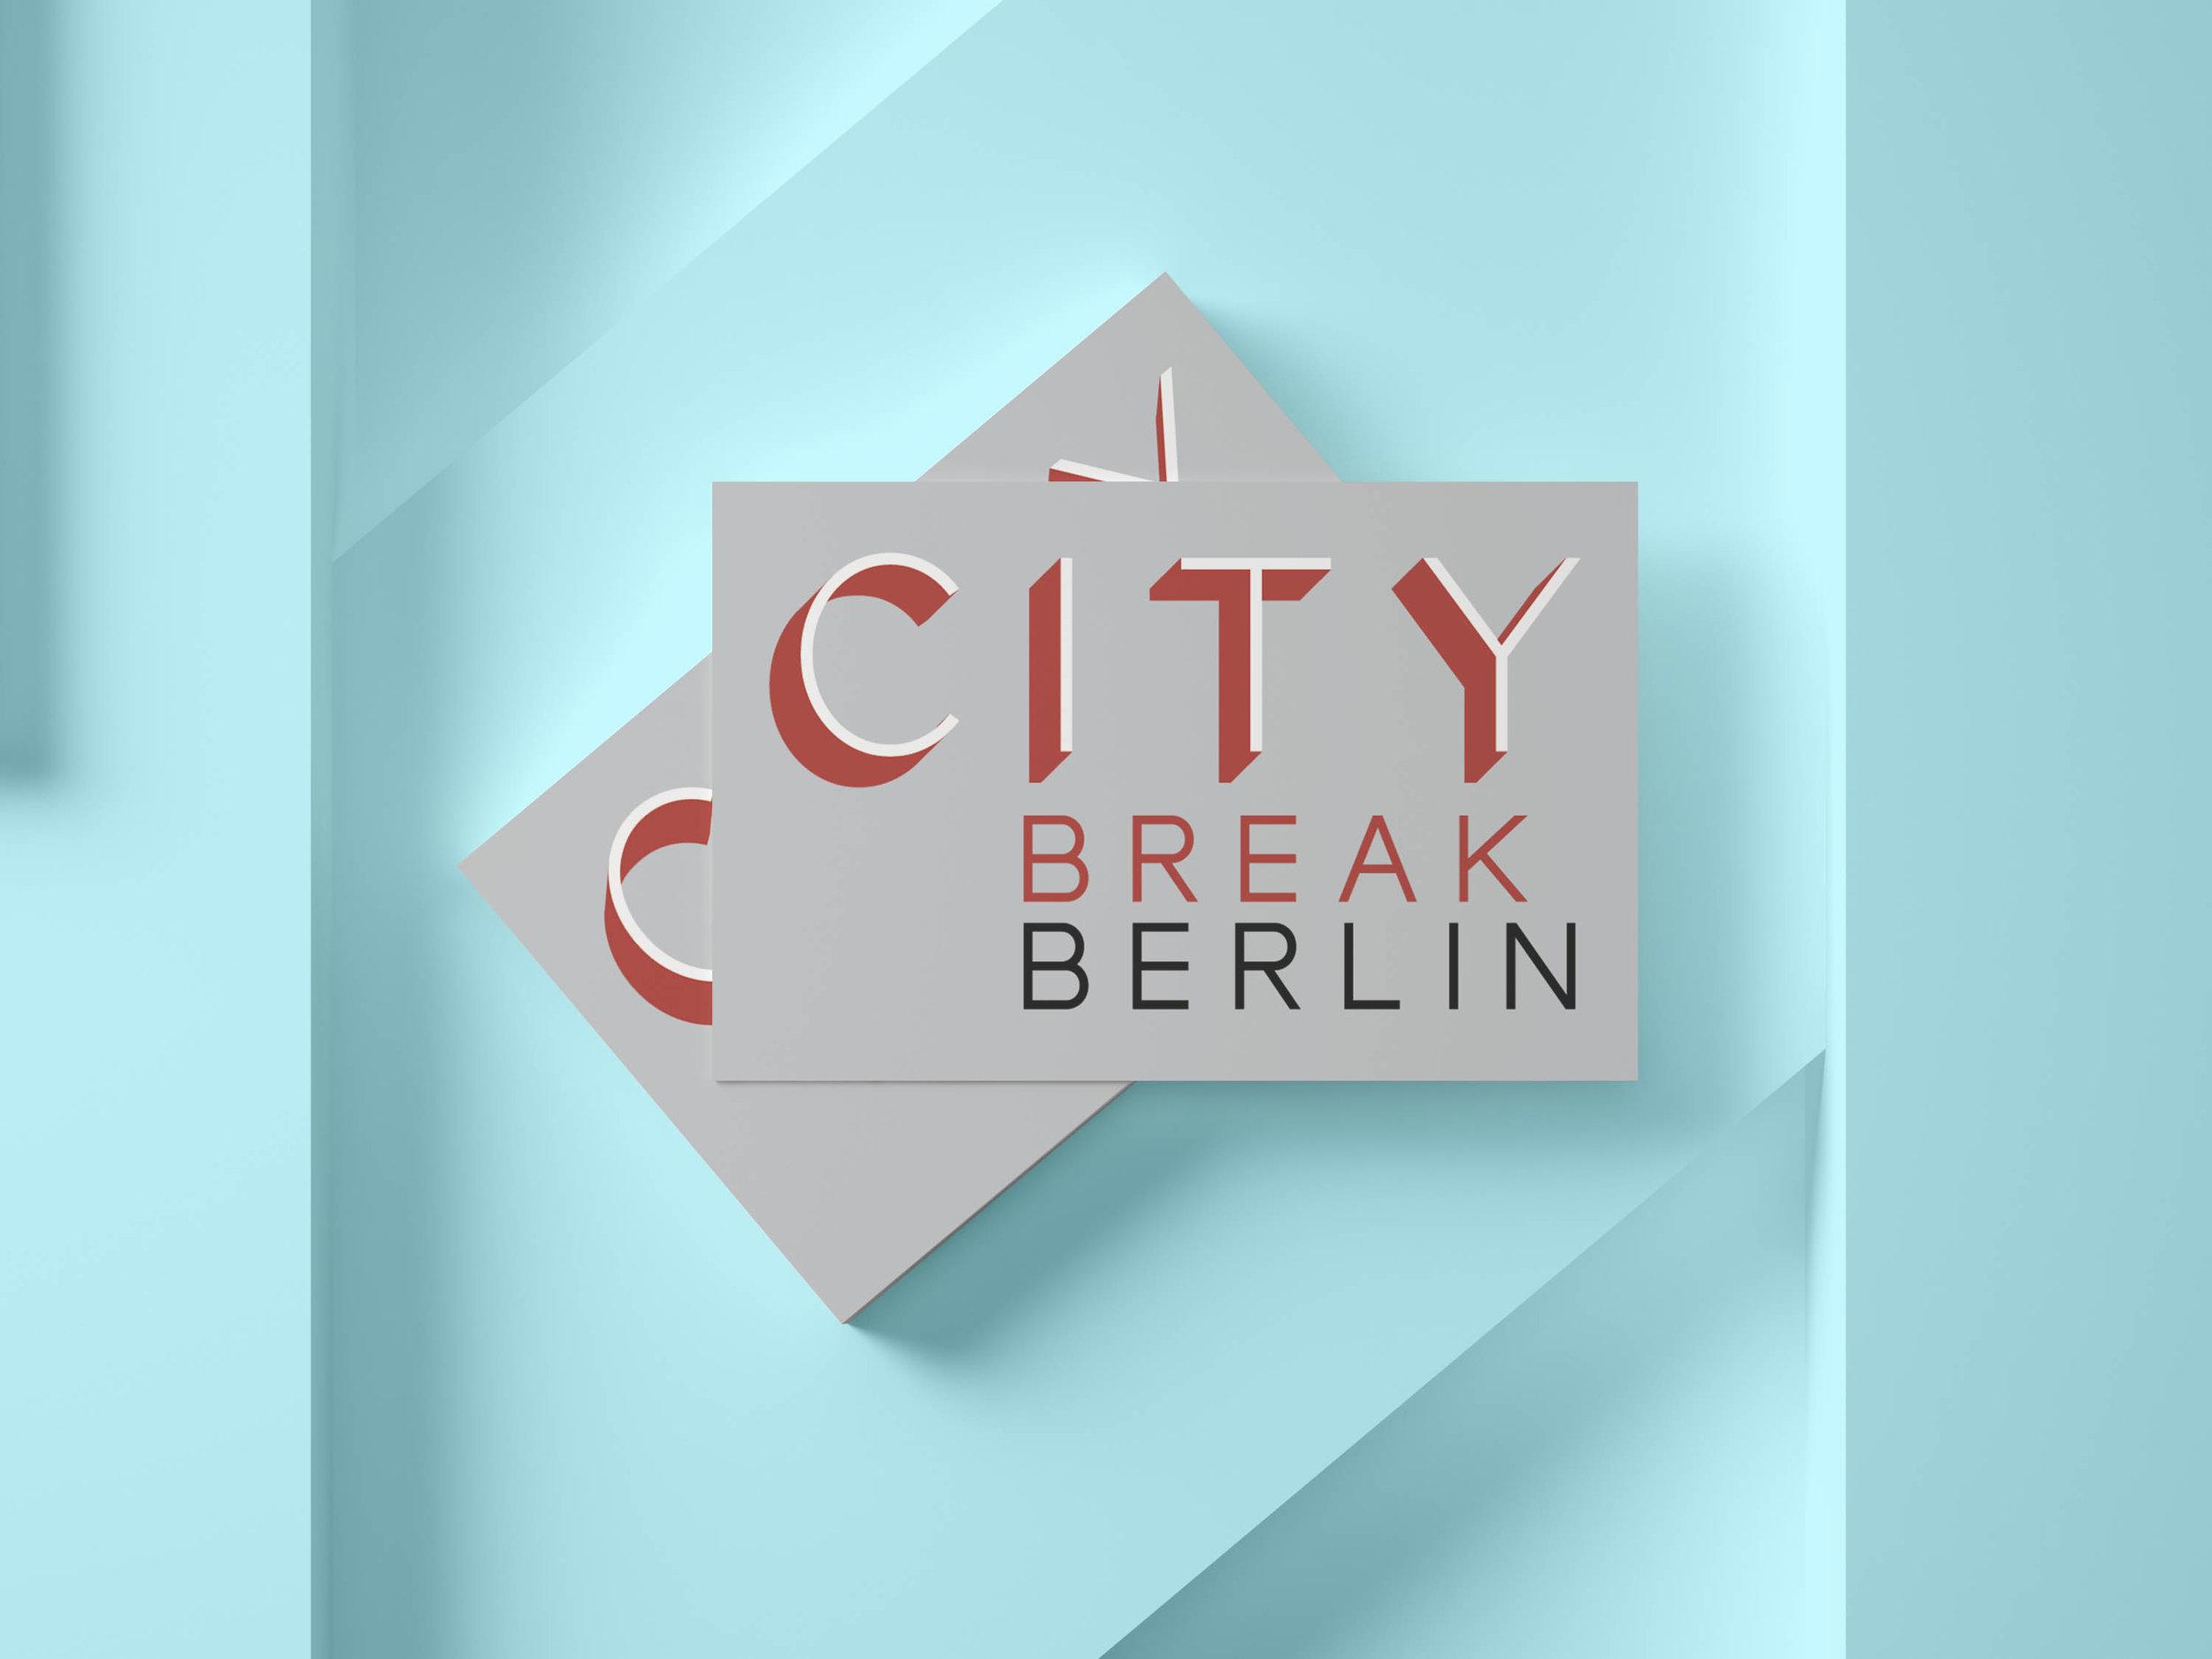 City break berlin.jpg